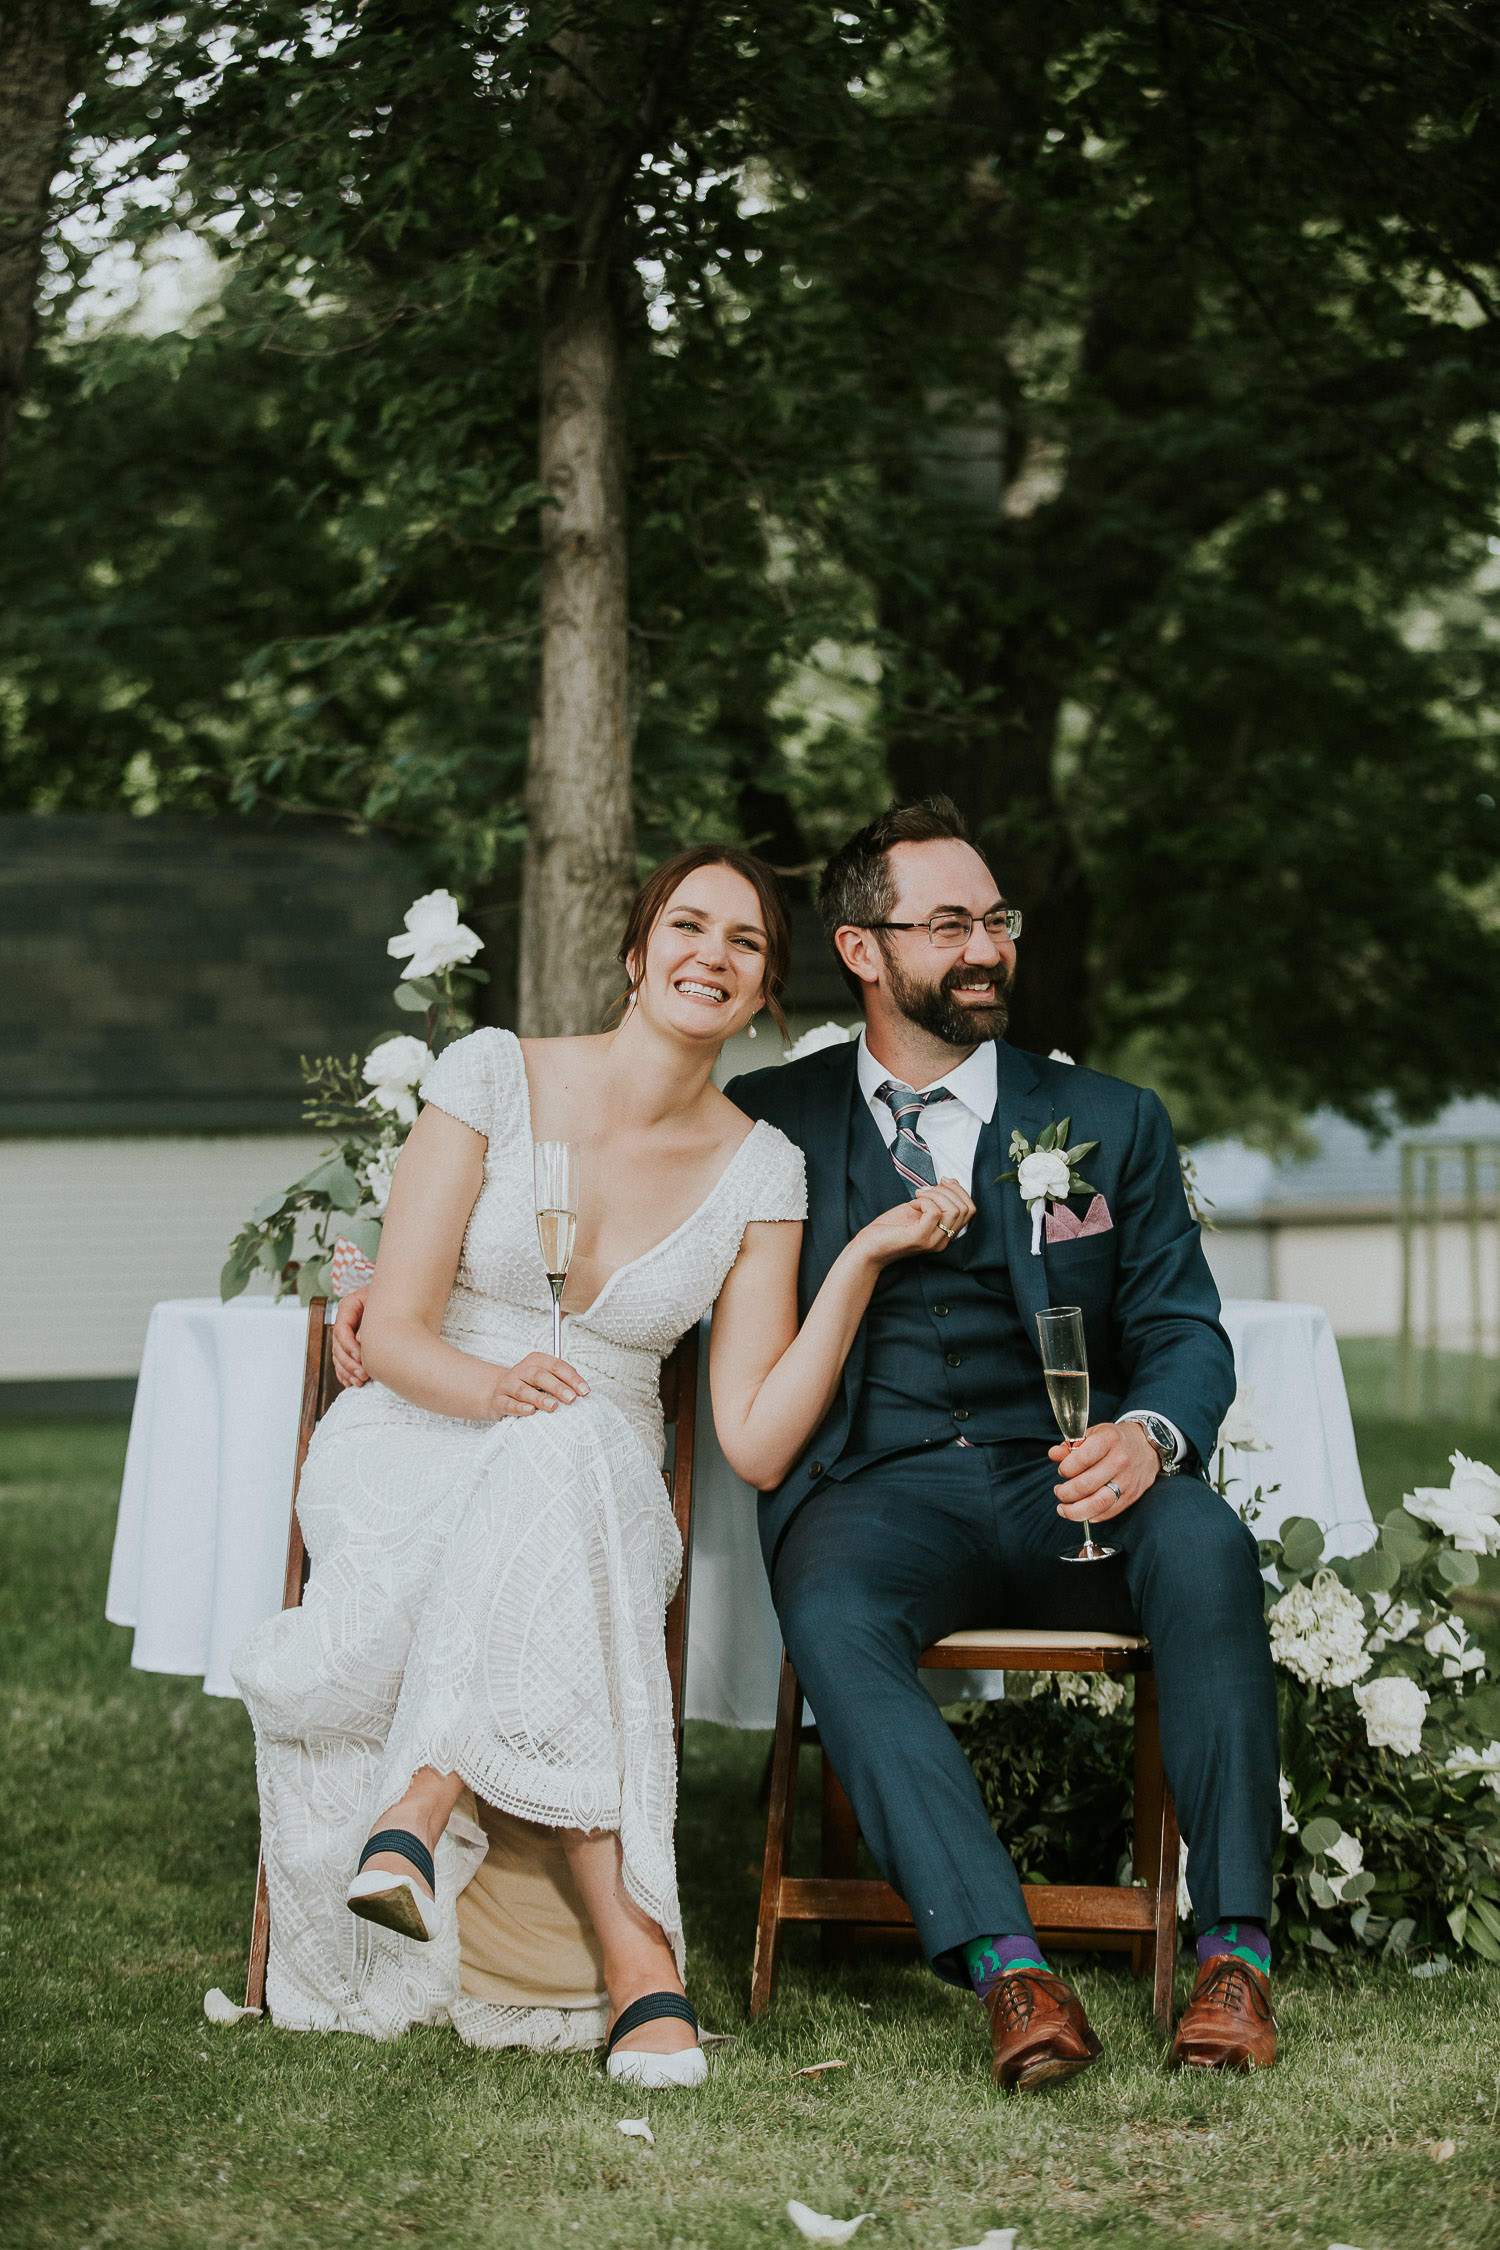 summer-backyard-wedding-in-alberta-sarah-pukin-0160